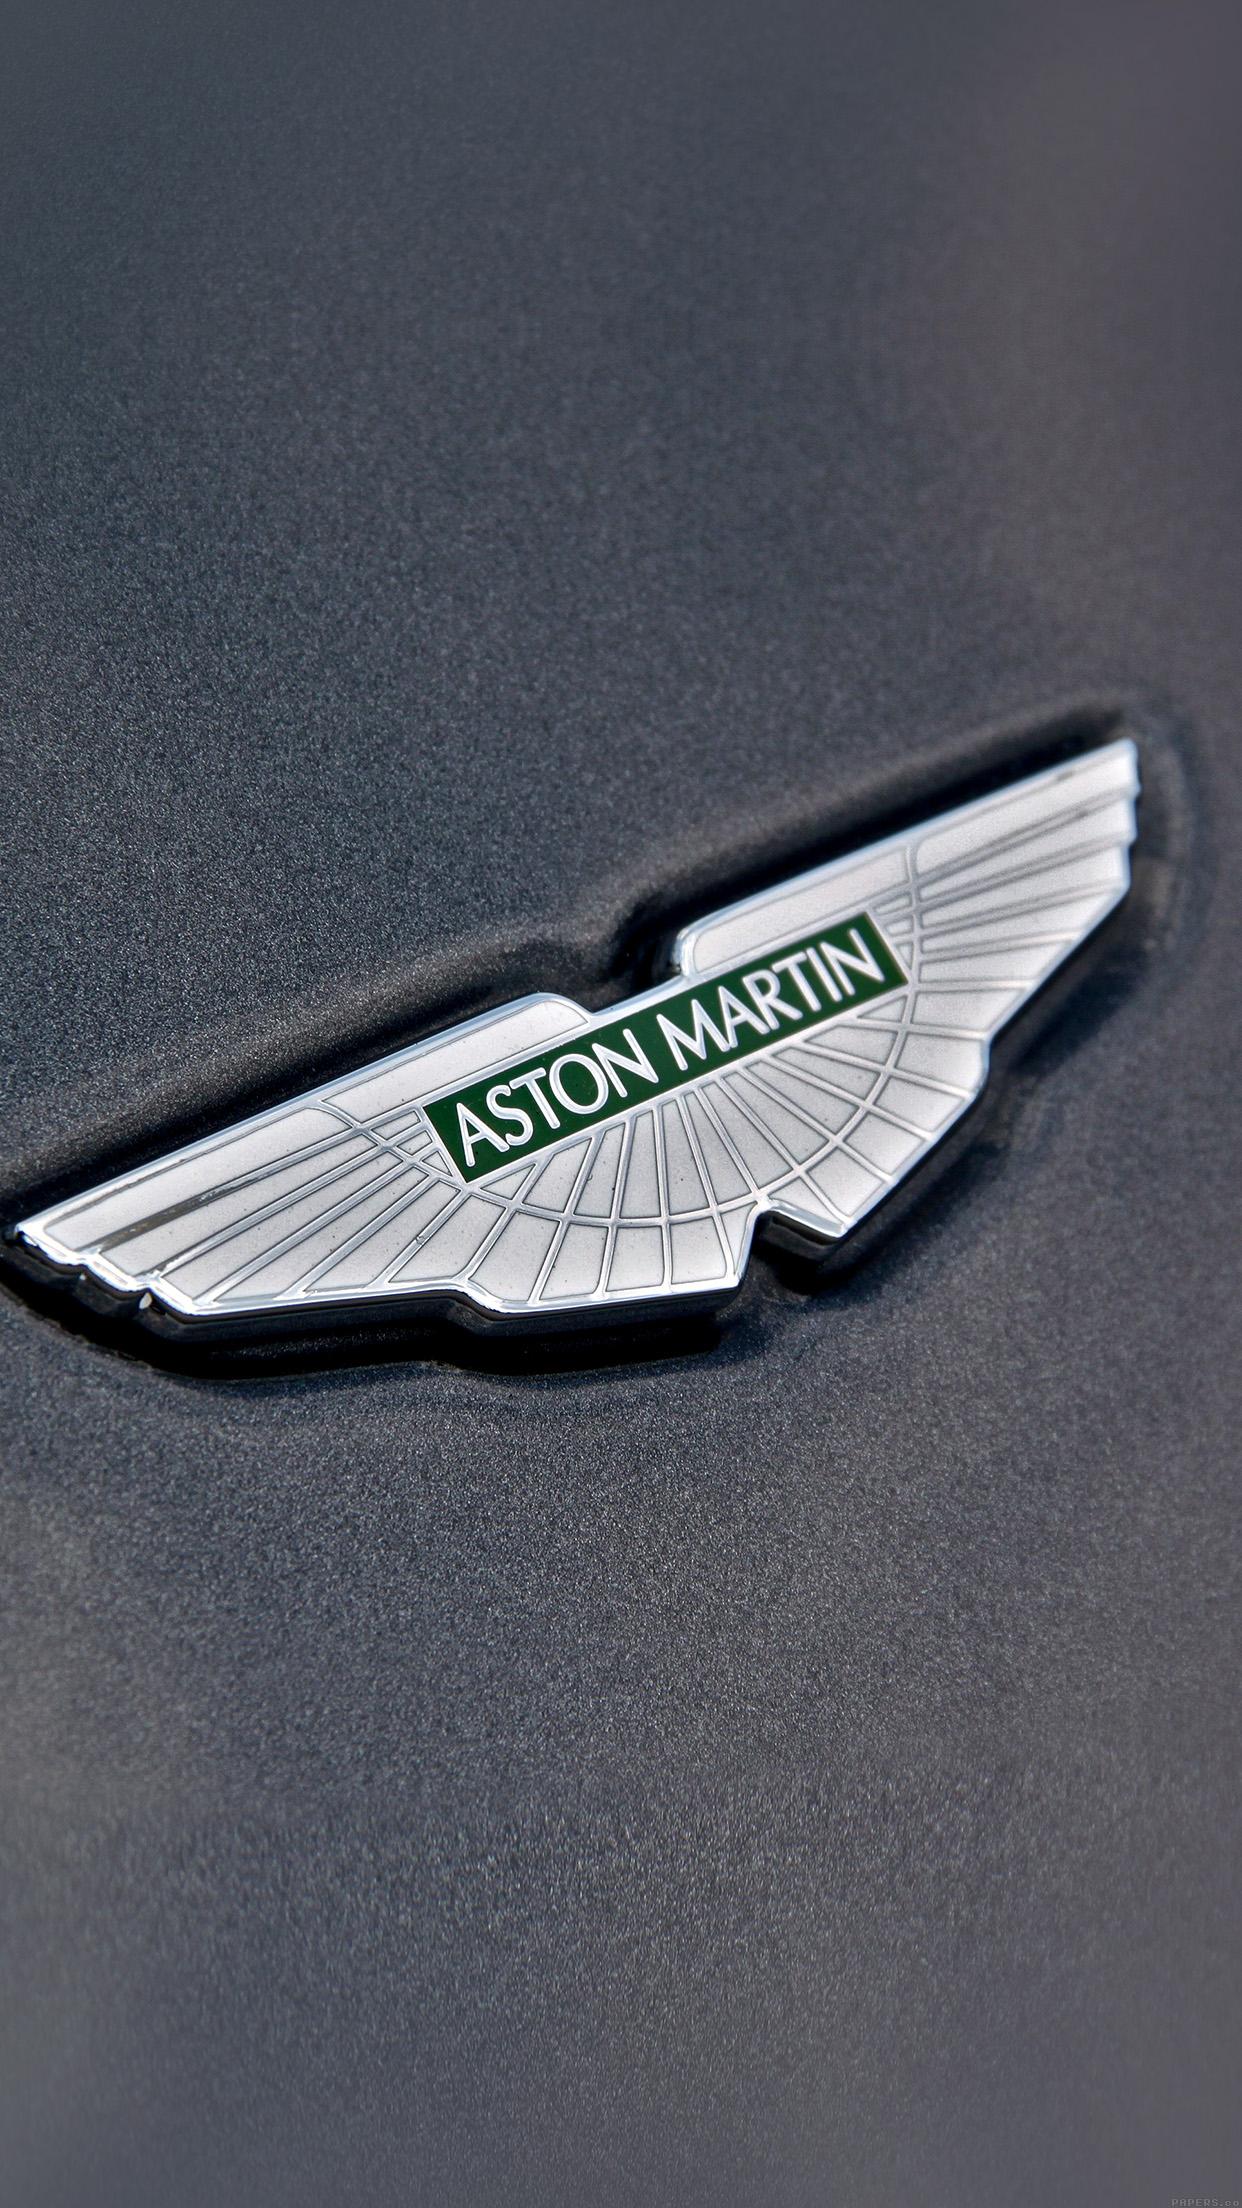 IPhonepapers Ajastonmartinlogocar - Aston martin logo